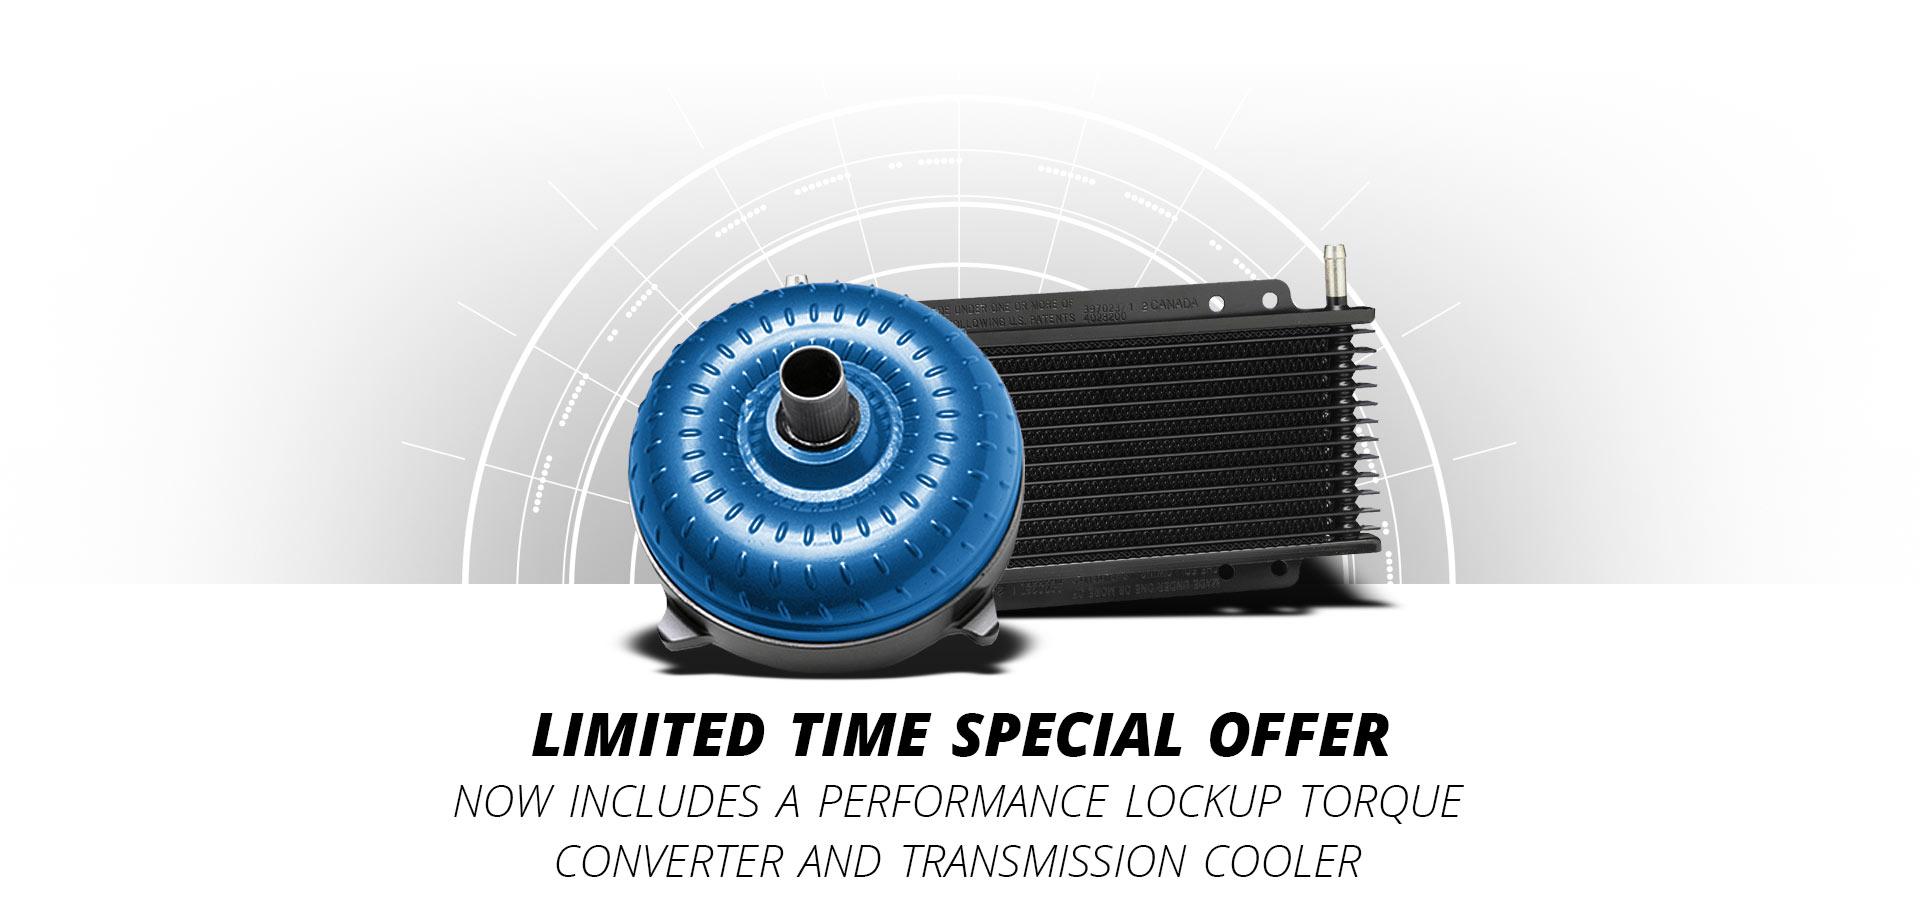 Performance 47RH Lockup Torque Converter Transmission Cooler